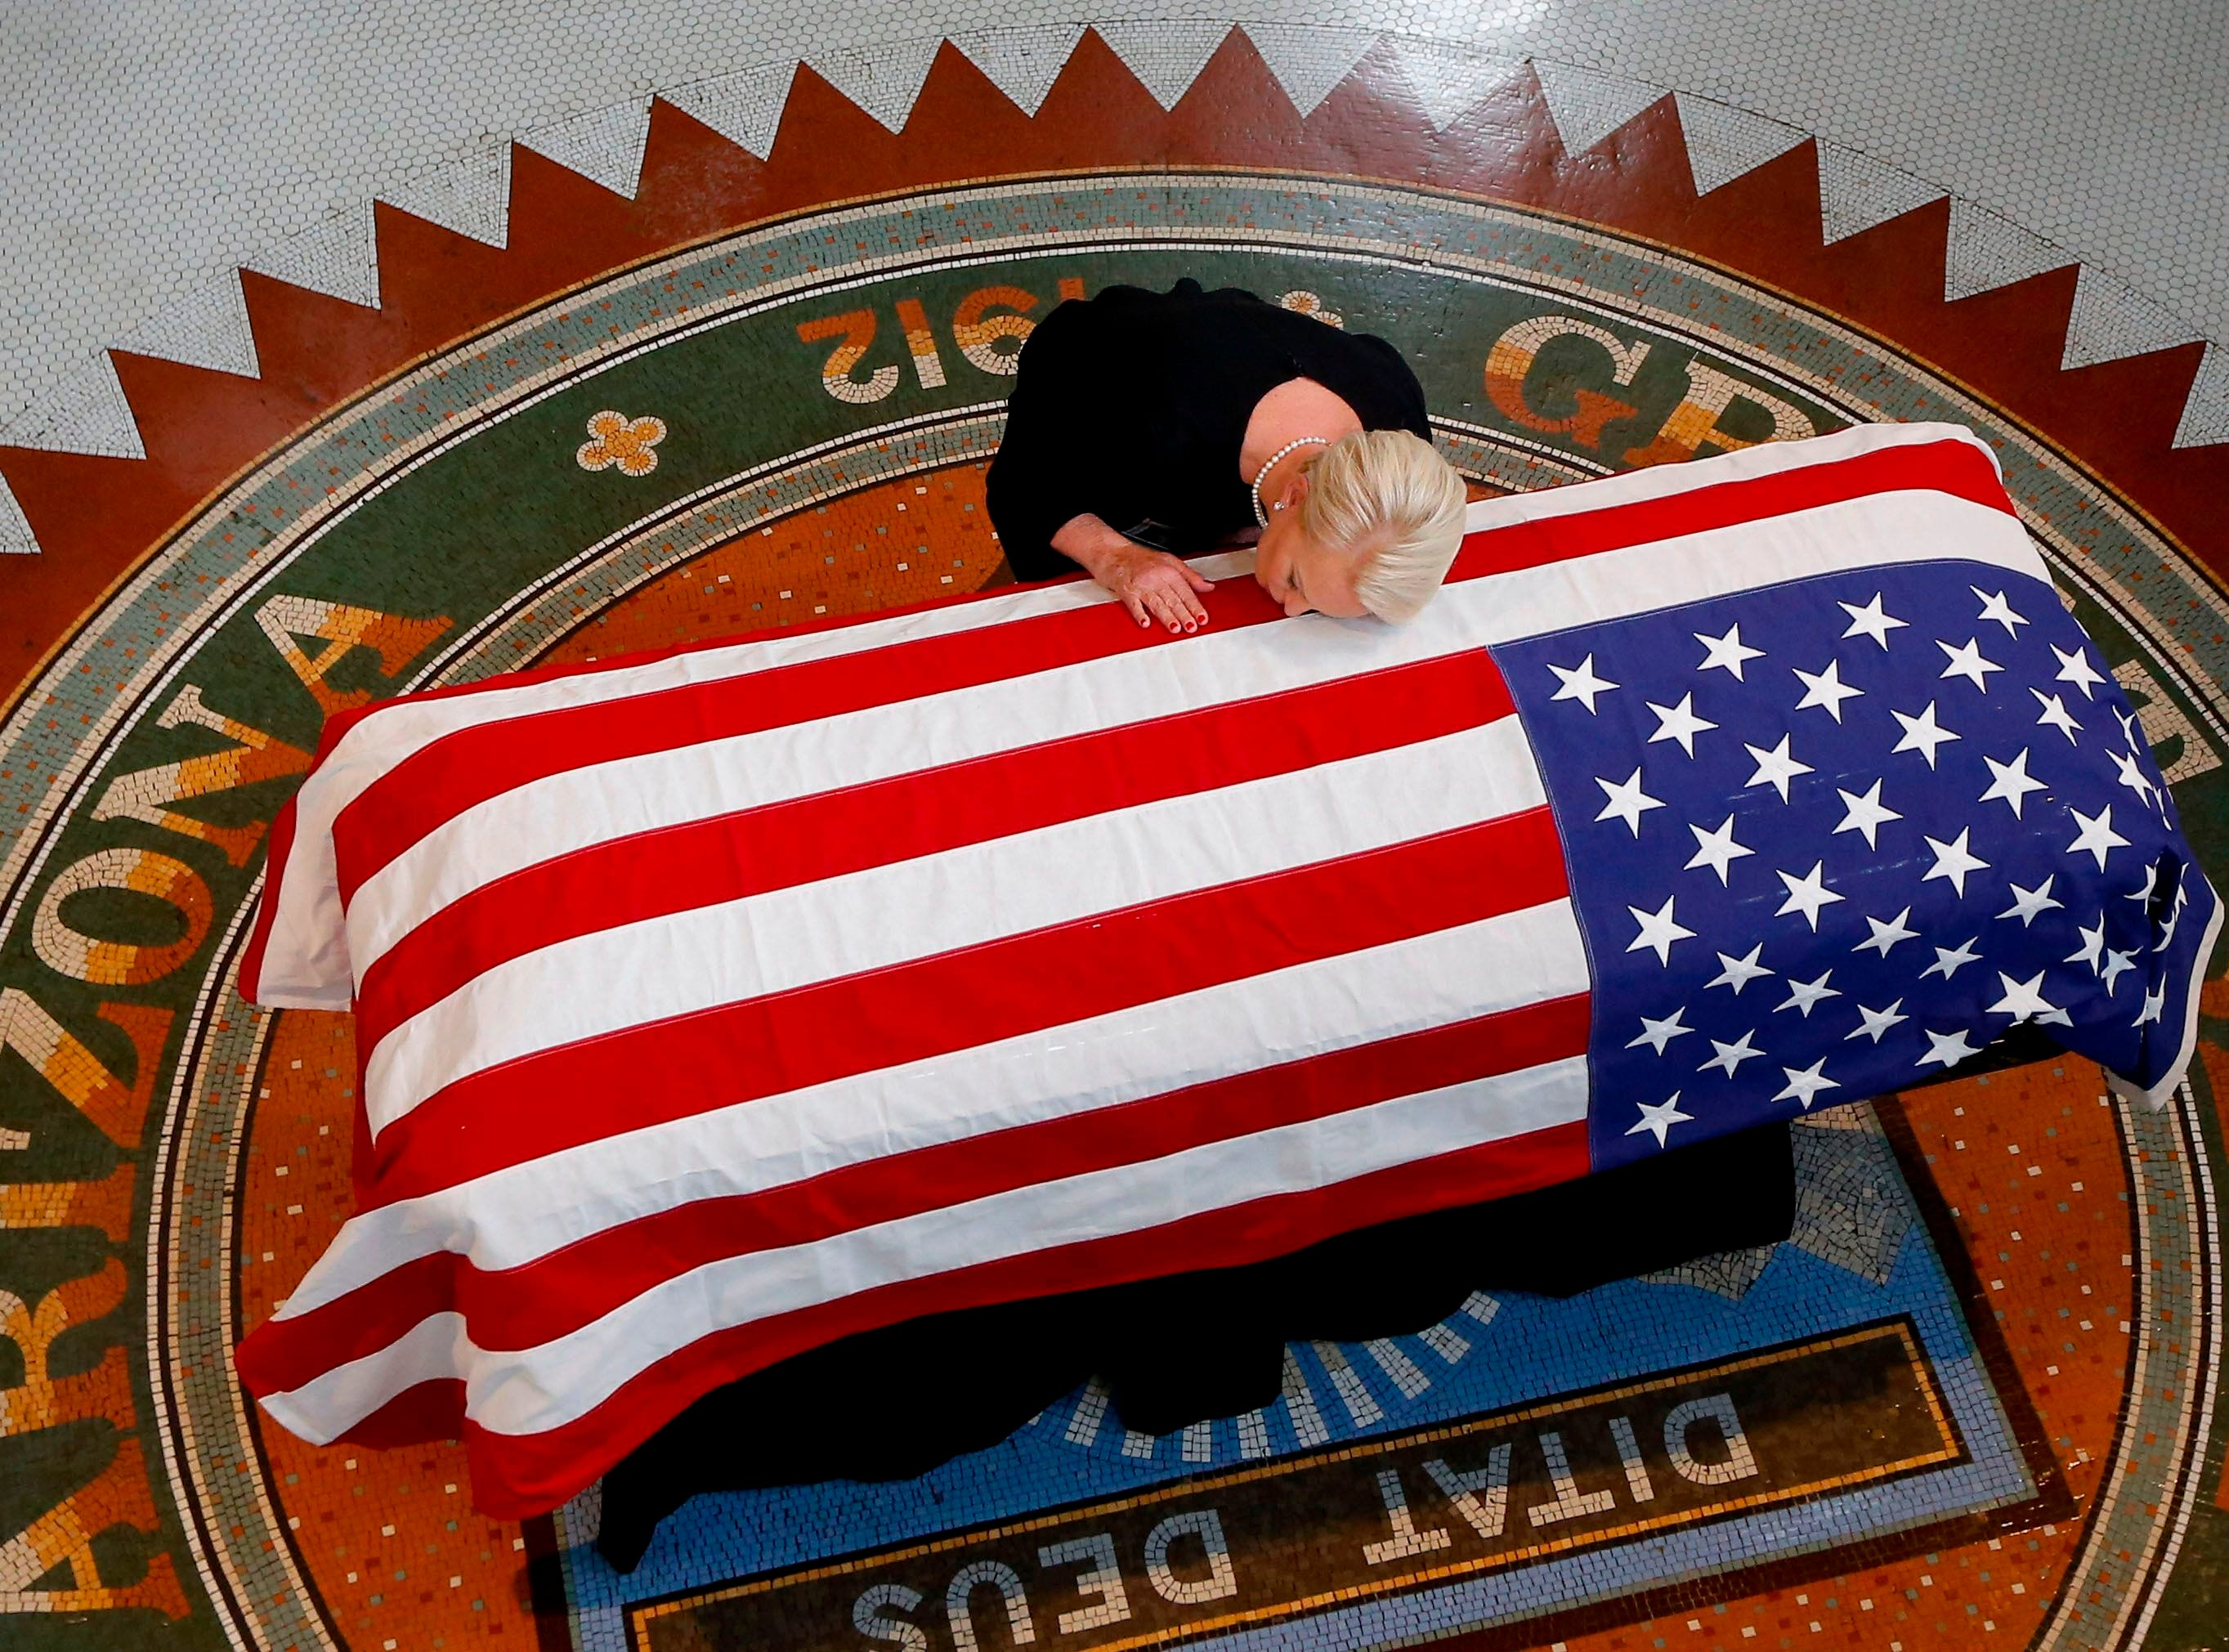 Aug. 29, 2018: Cindy McCain, wife of Senator John McCain, kisses his casket during a memorial service at the Arizona Capitol in Phoenix.